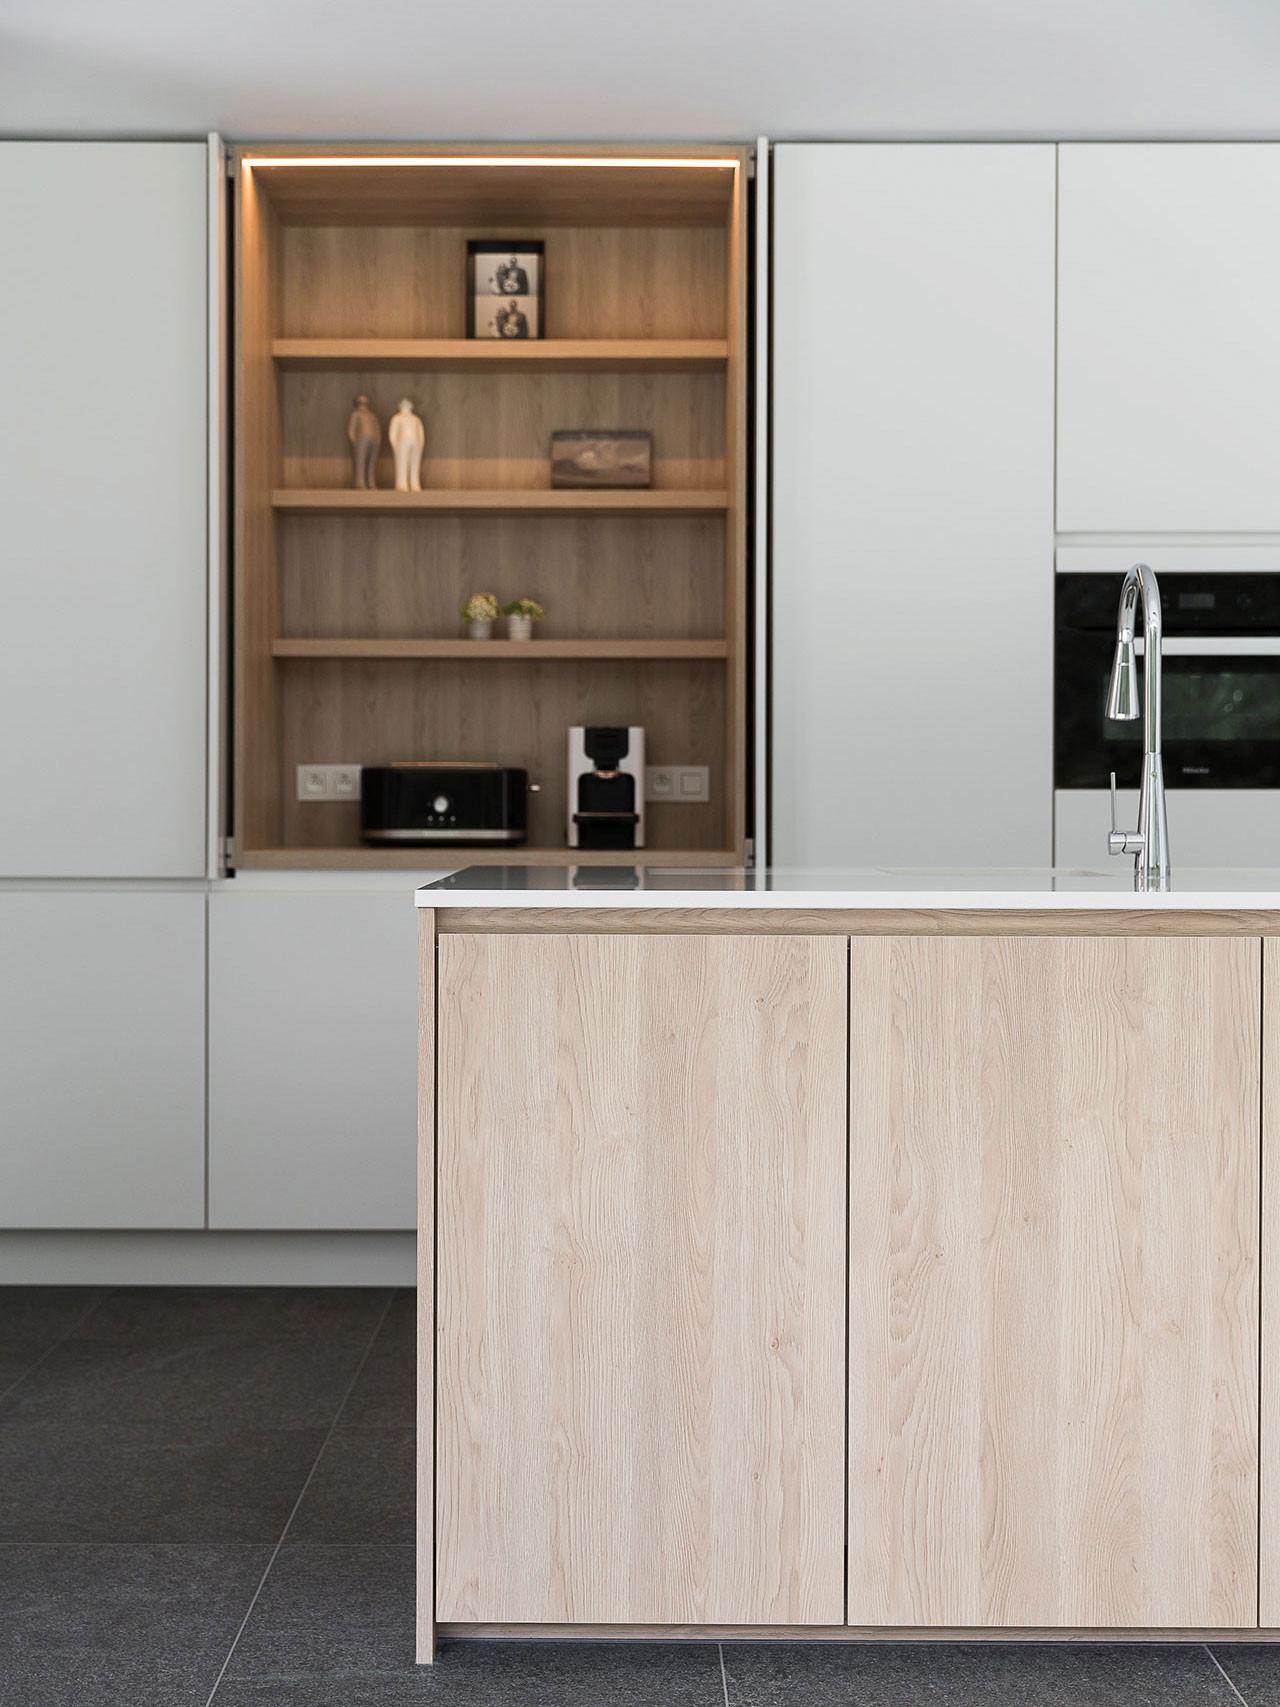 Dekeyzer-hedendaagse-keuken-greeploos-satijnlak-houtdecor-3.jpg